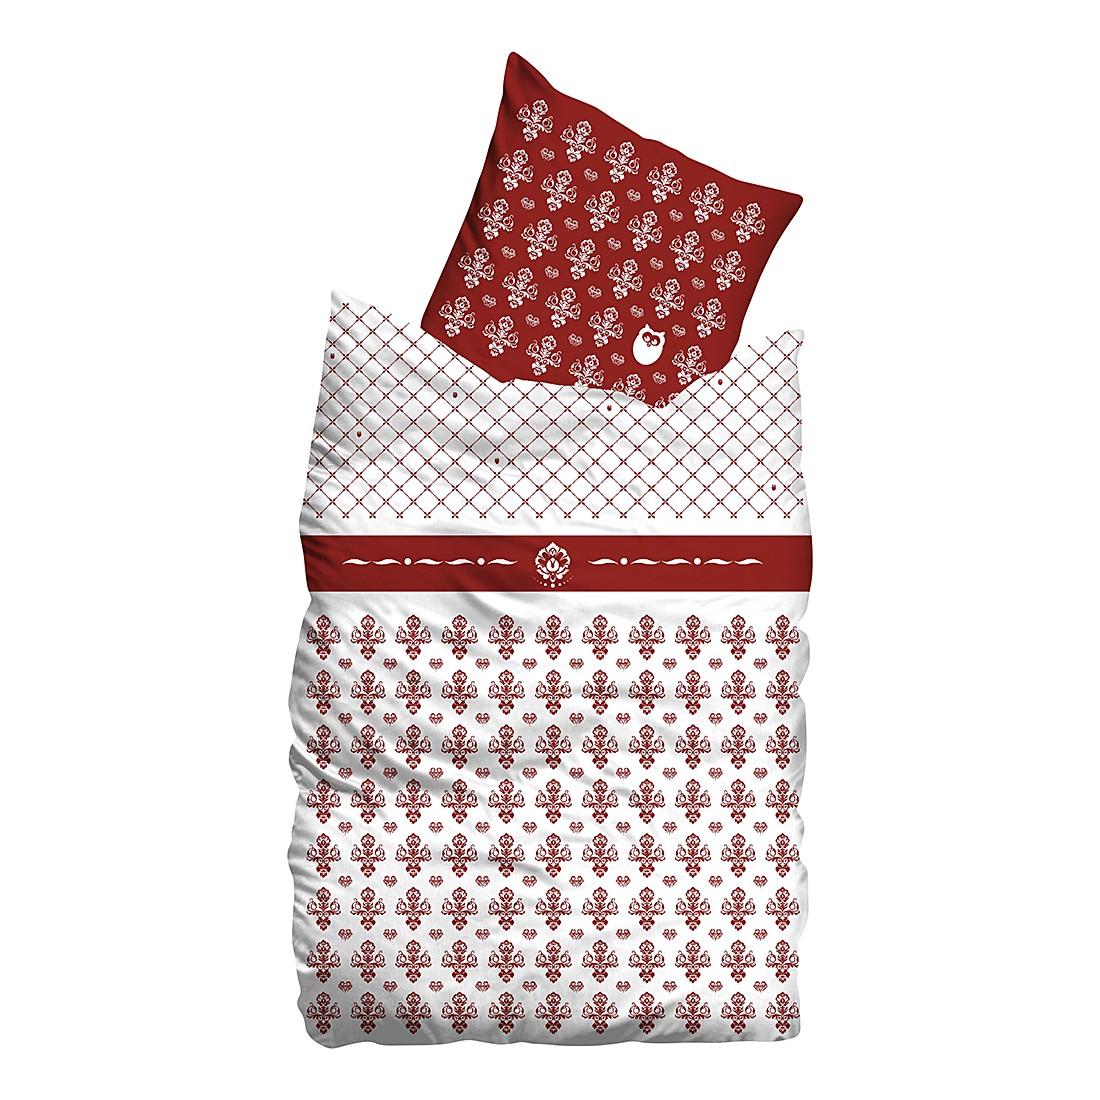 Linnen beddengoed Flourish - Wit/rood - 135x200cm + kussen 80x80cm, Suenos